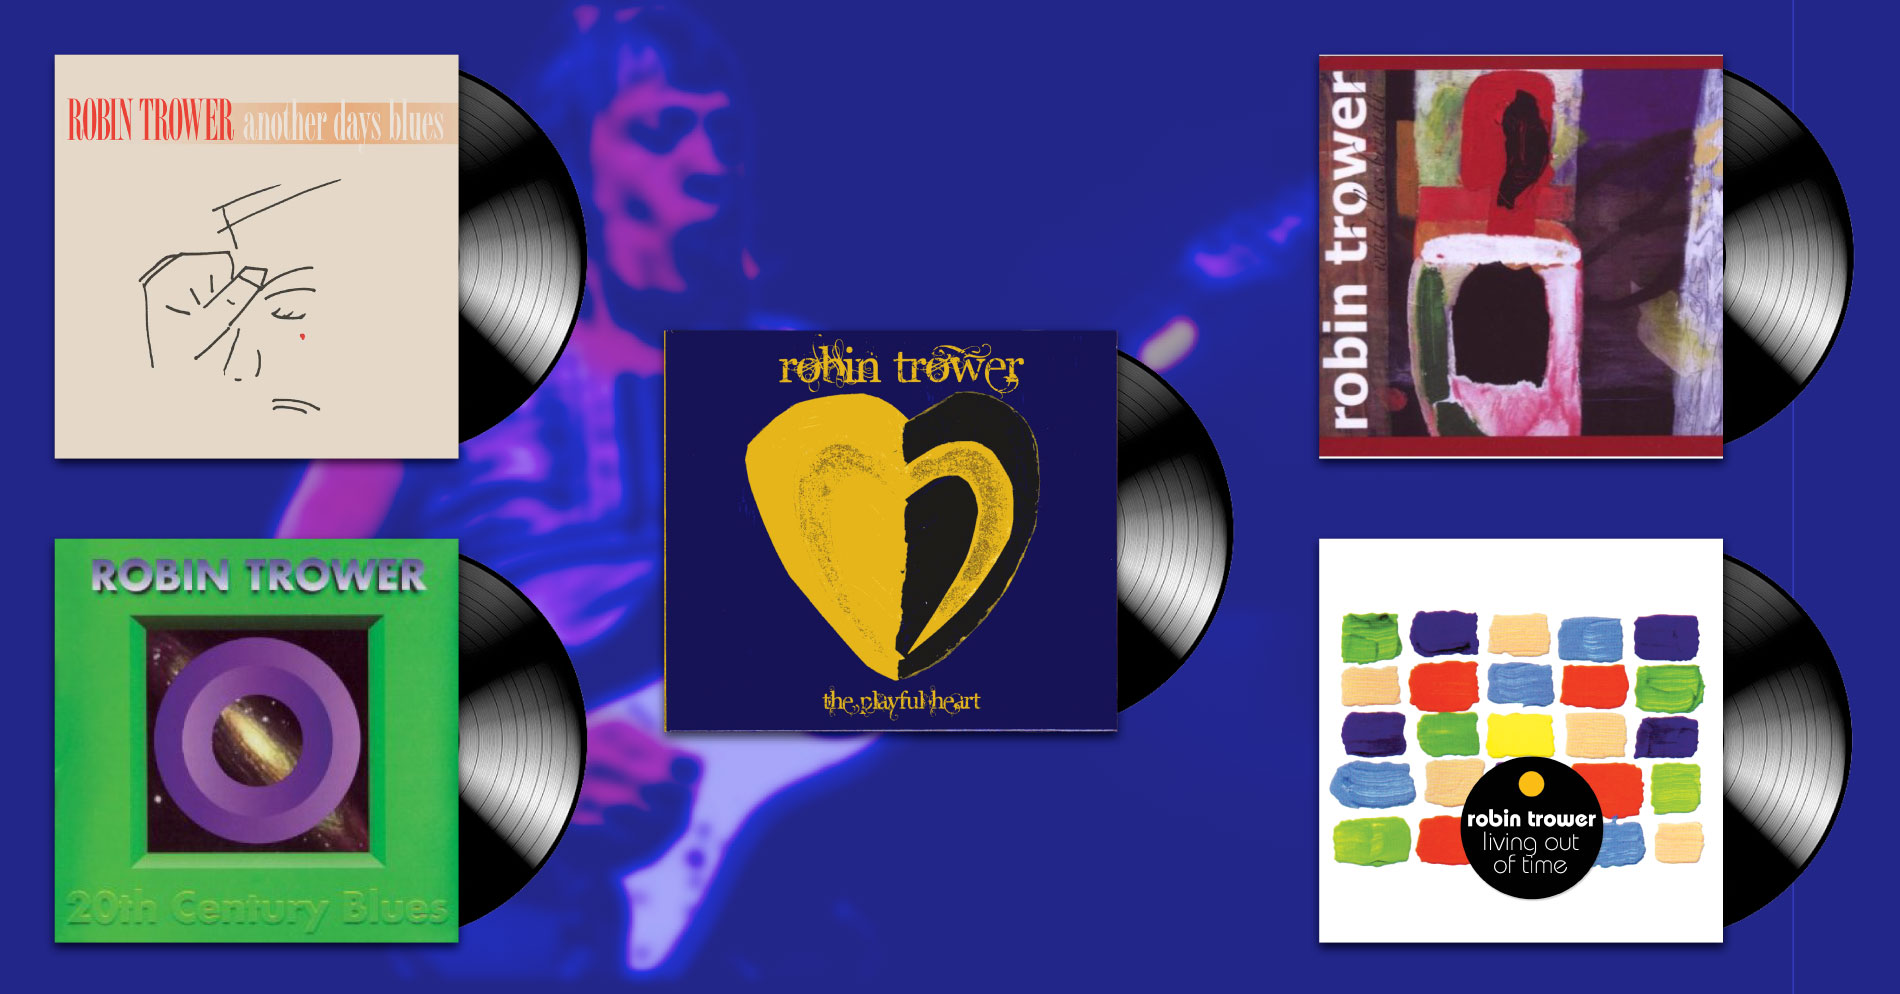 5 New Releases on Deluxe Vinyl!